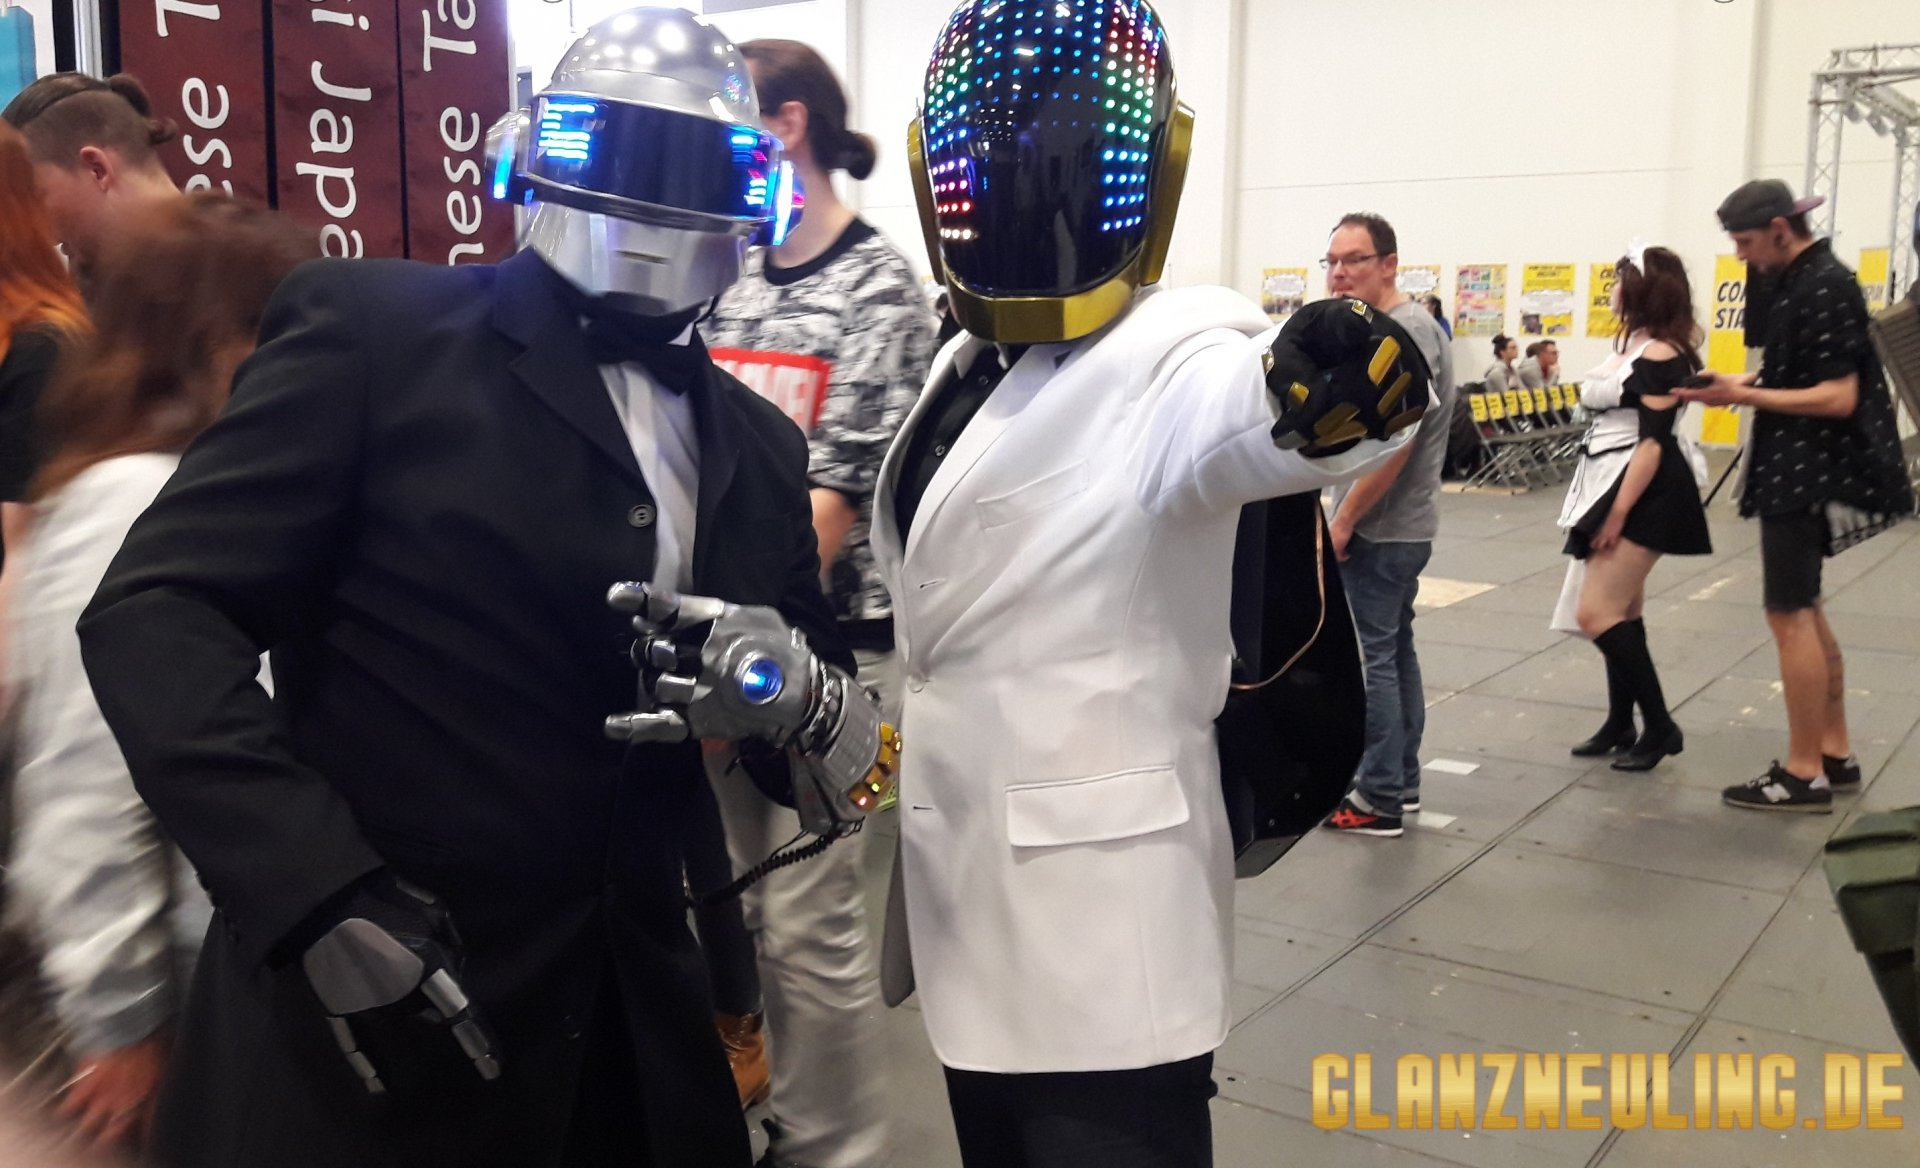 Helme wie Daft Punk